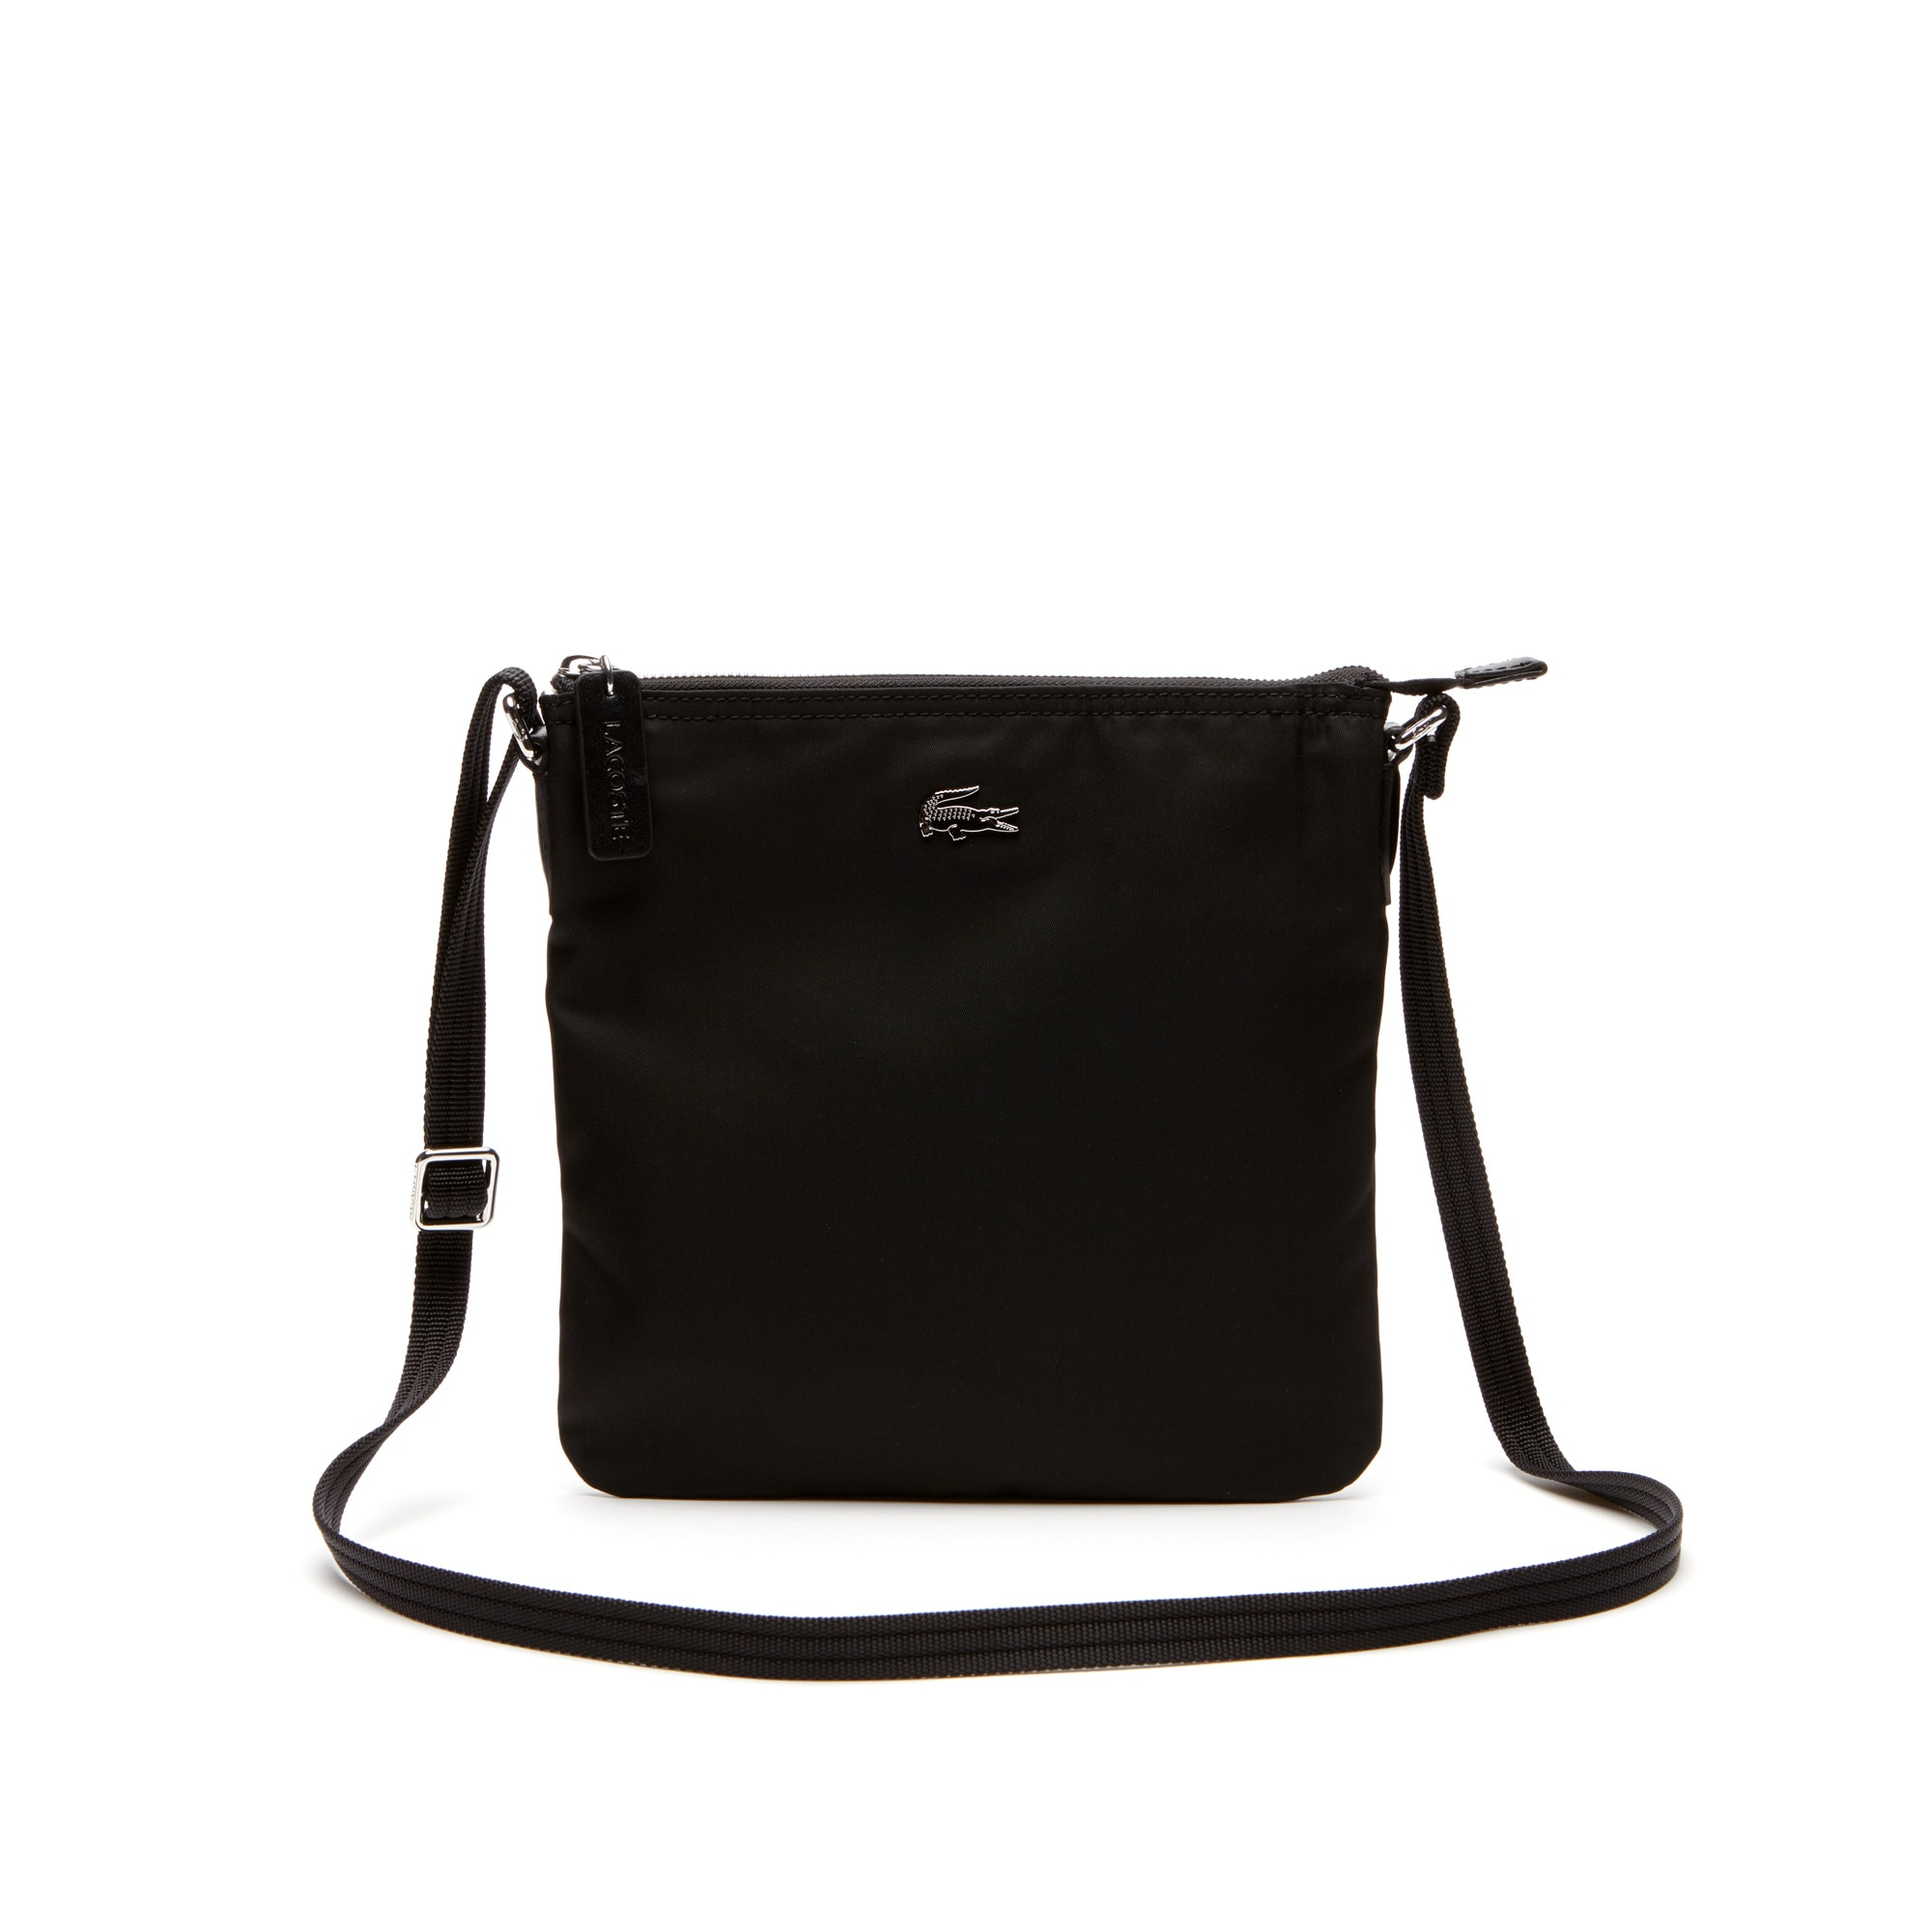 Women's L.12.12 Nylon Flat Crossover Bag